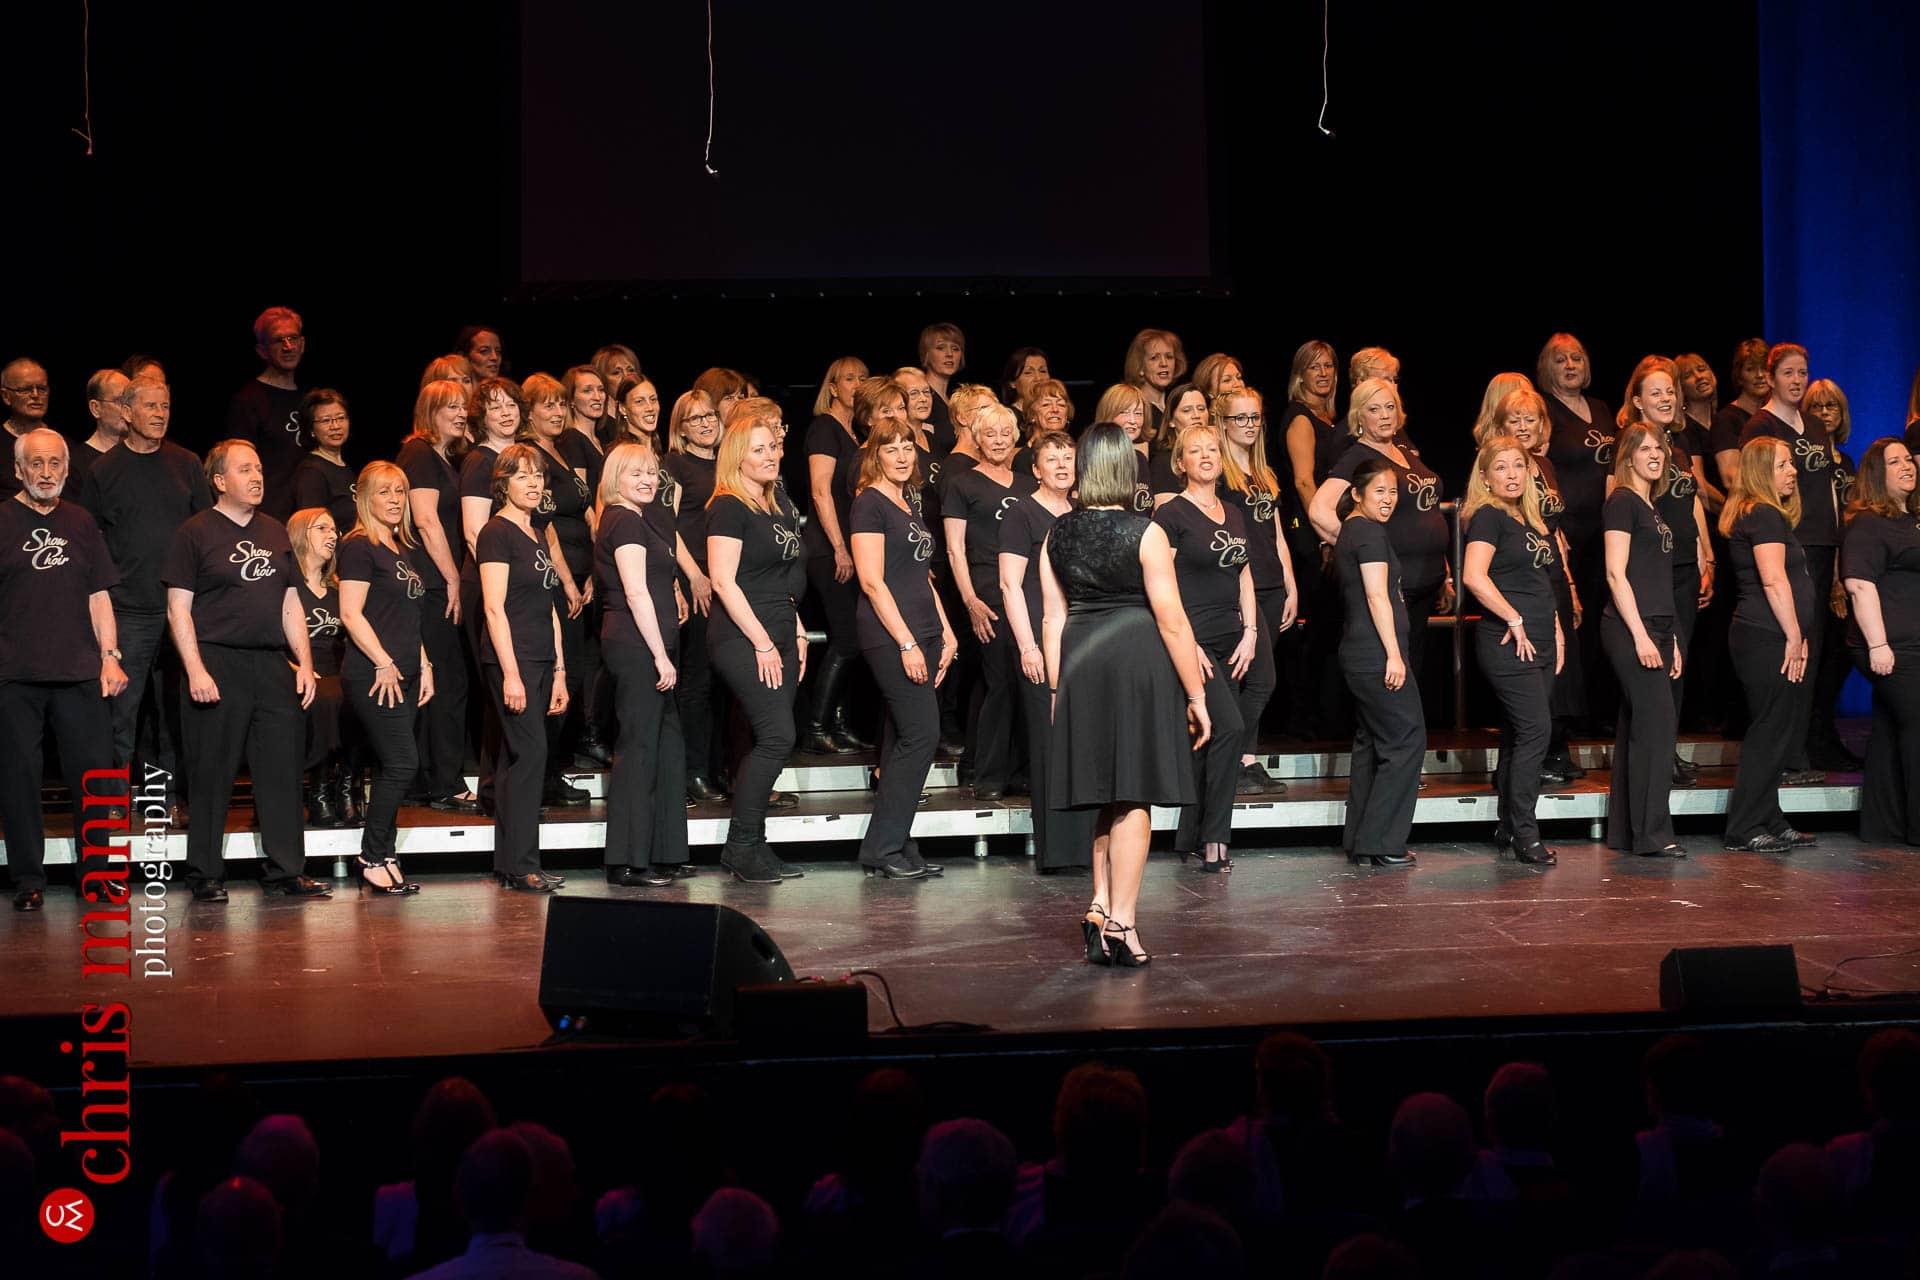 Choiroke-2016-concert-Dorking-Halls-042